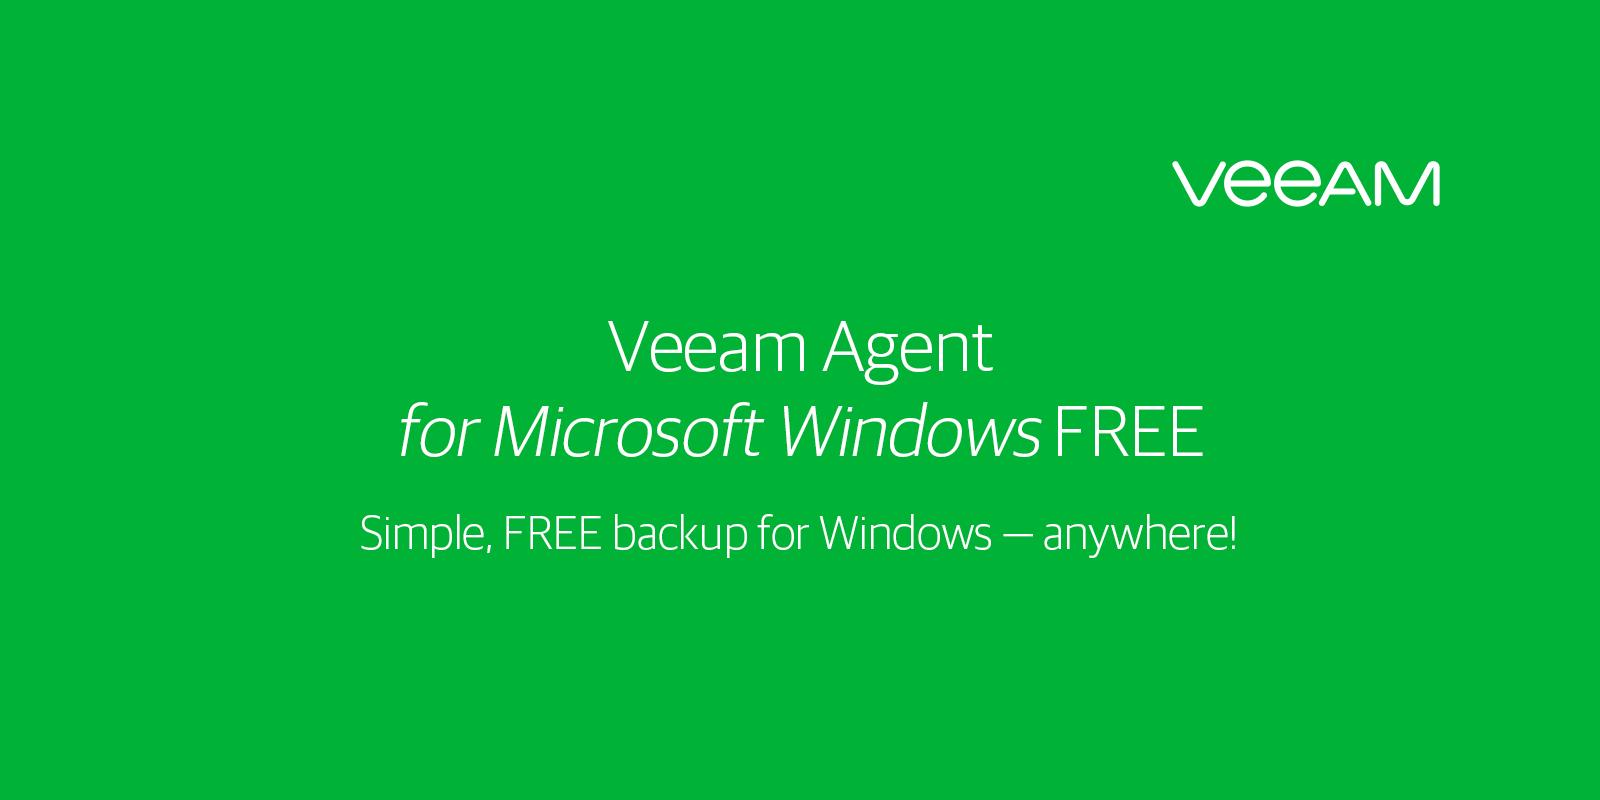 Free Windows Backup for Endpoint, Server and Desktop - Veeam